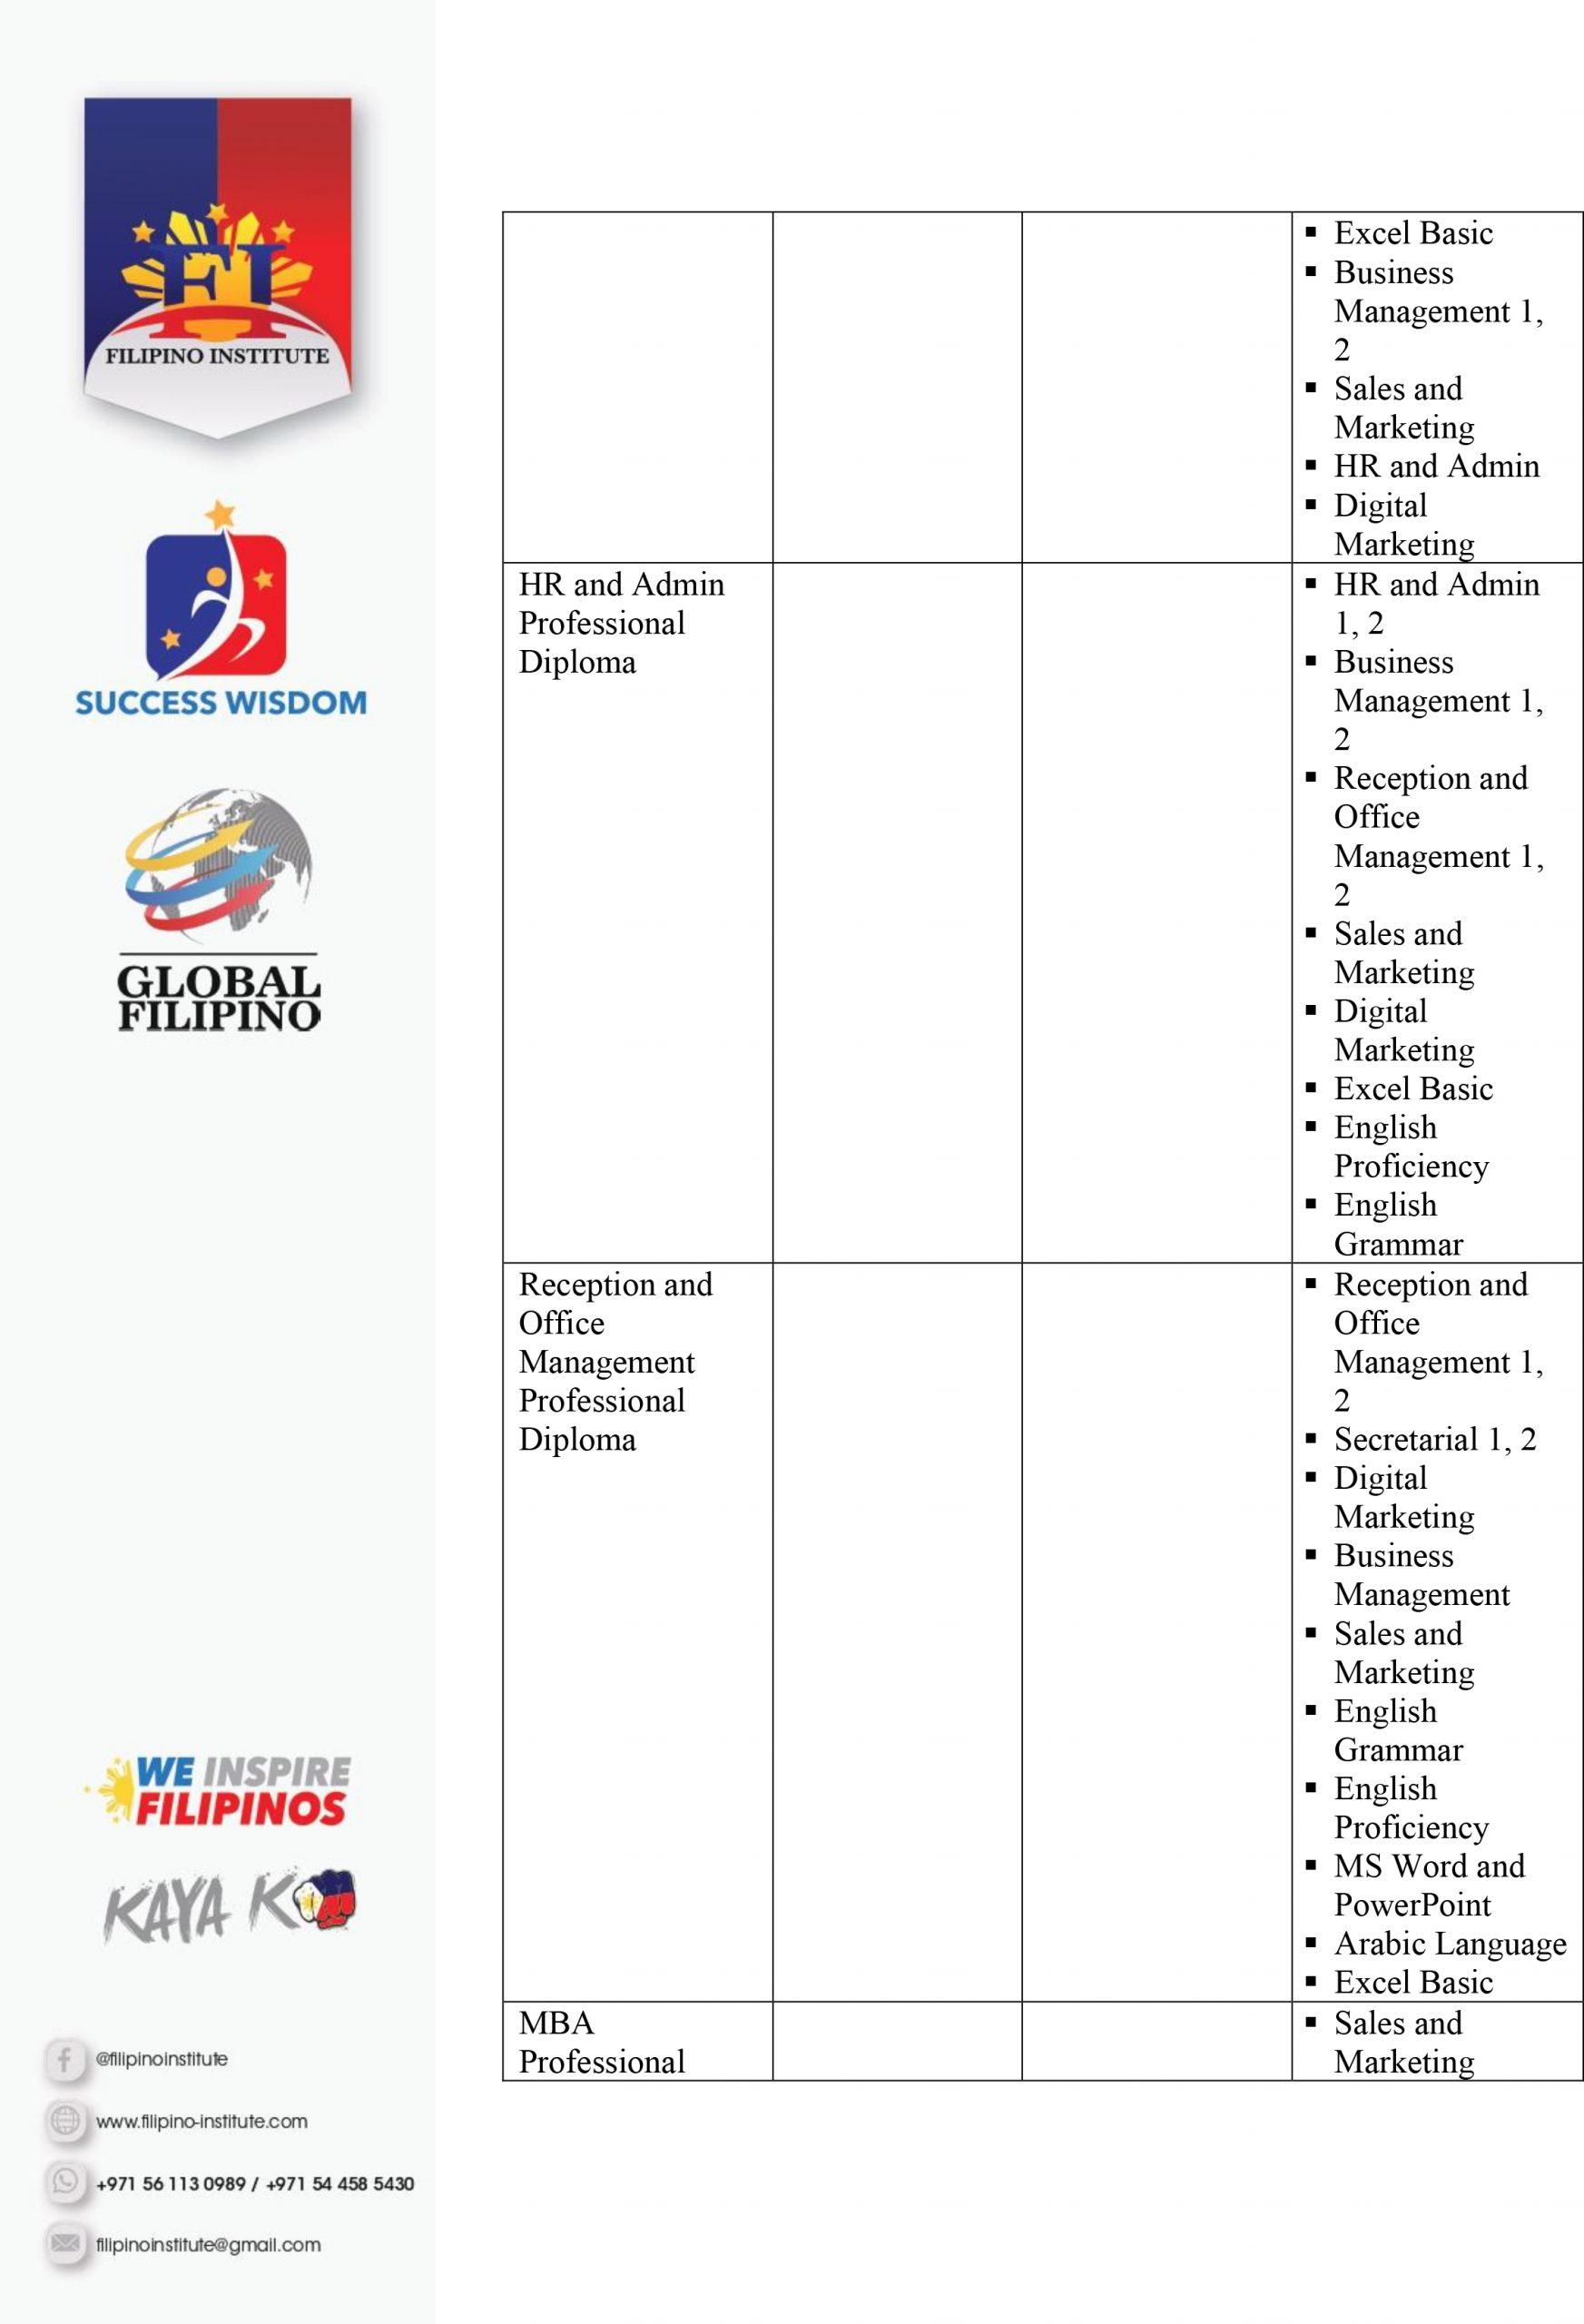 Subject : Professional Diploma Conversion RulesDate : January 26, 2021 Memo No. : FI-020-2021